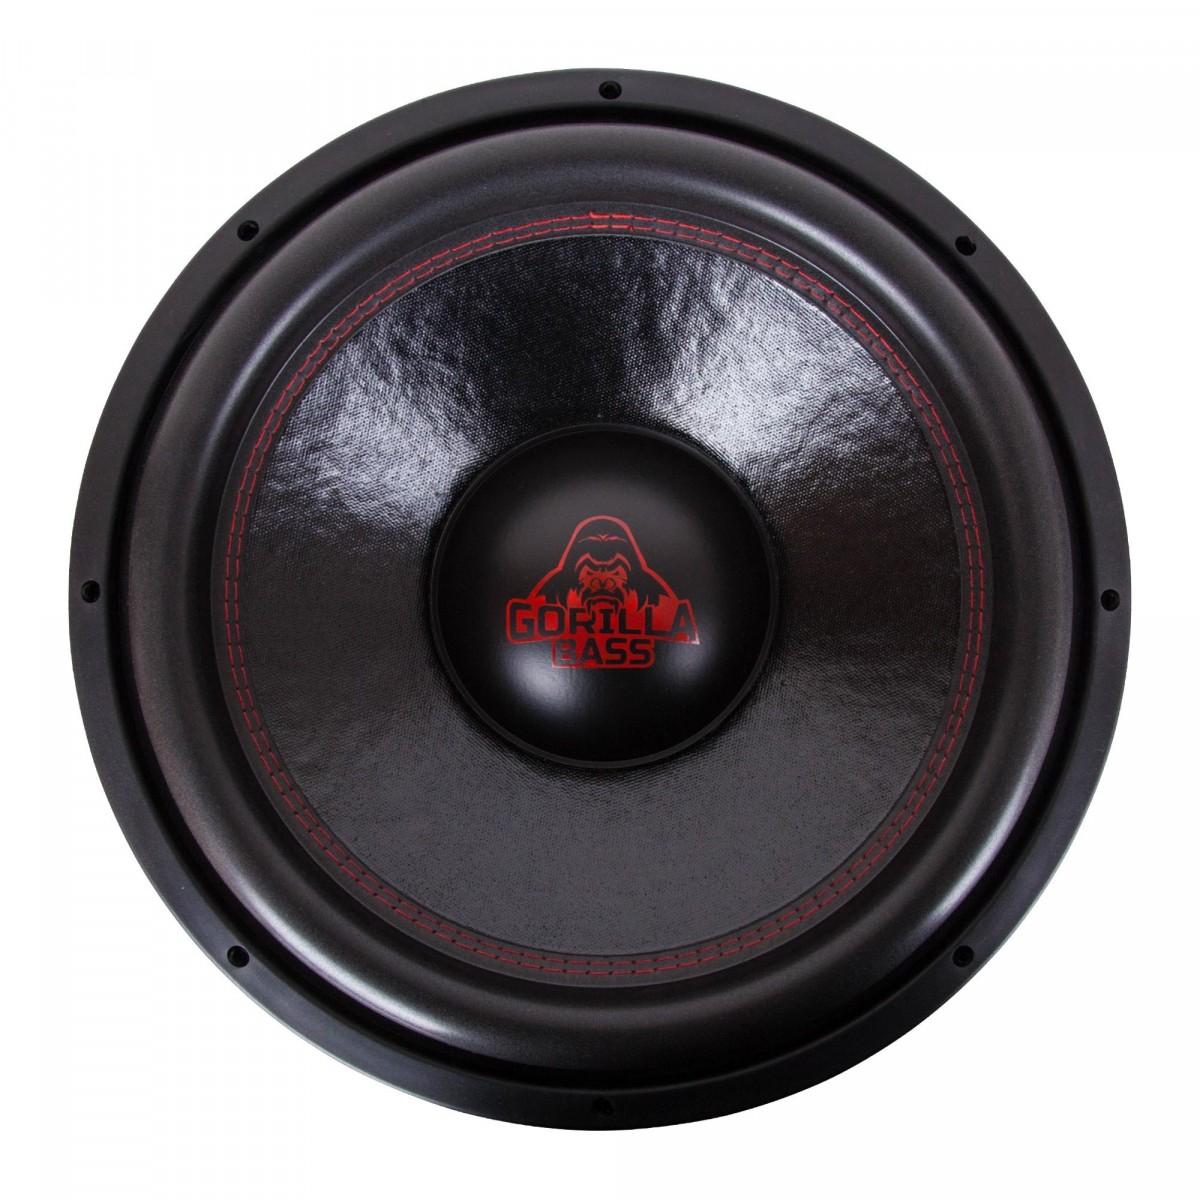 Сабвуфер Kicx Gorilla Bass E15